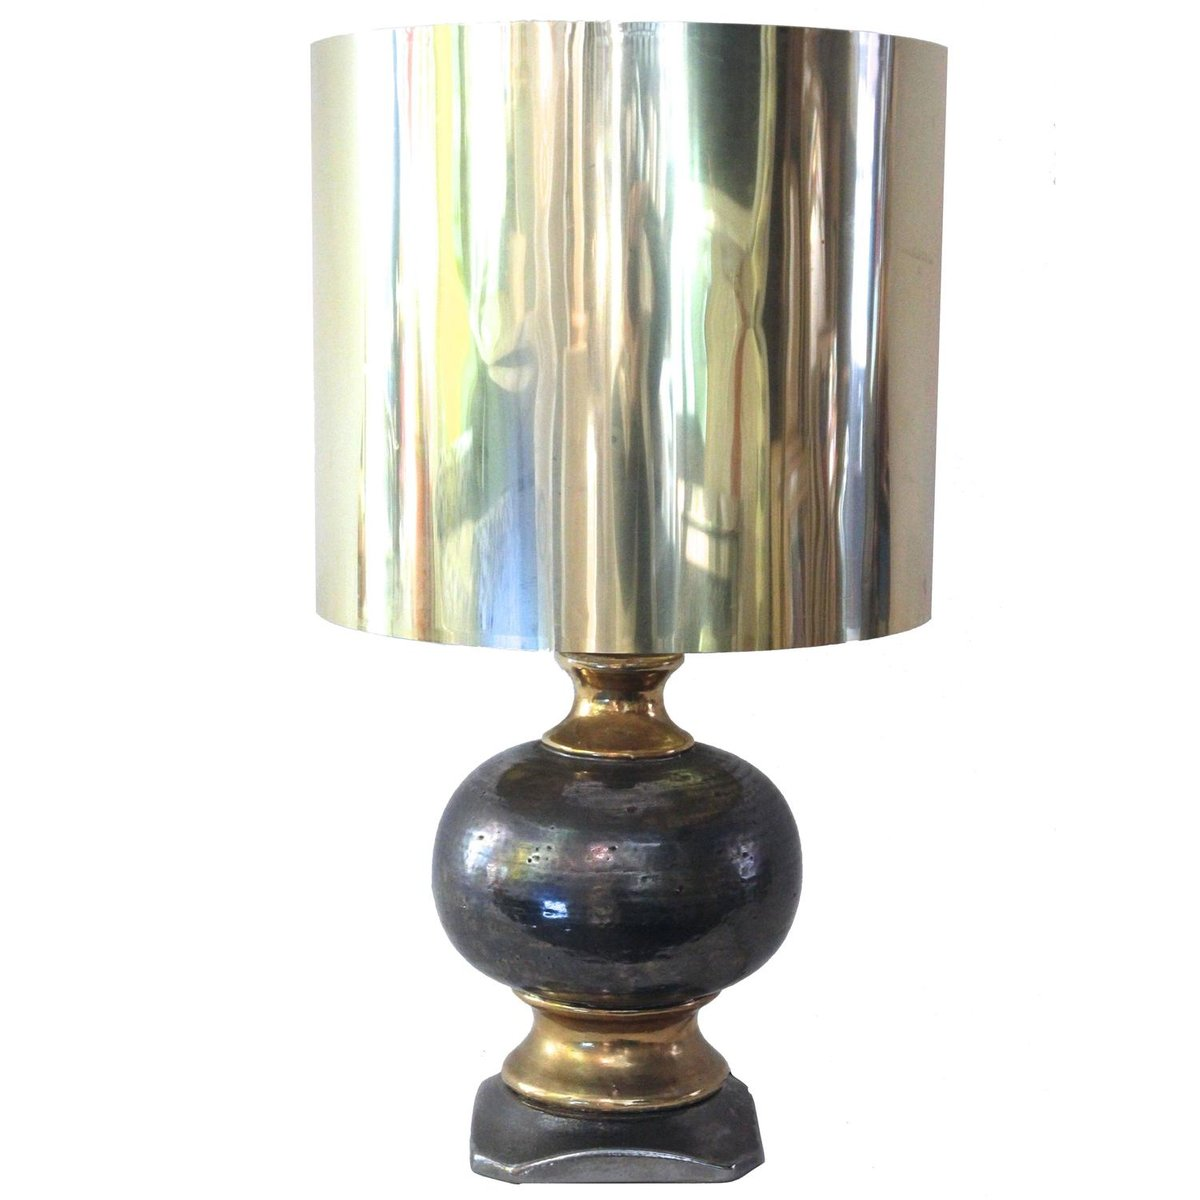 Tischlampe aus Keramik & Blattsilber, 1970er